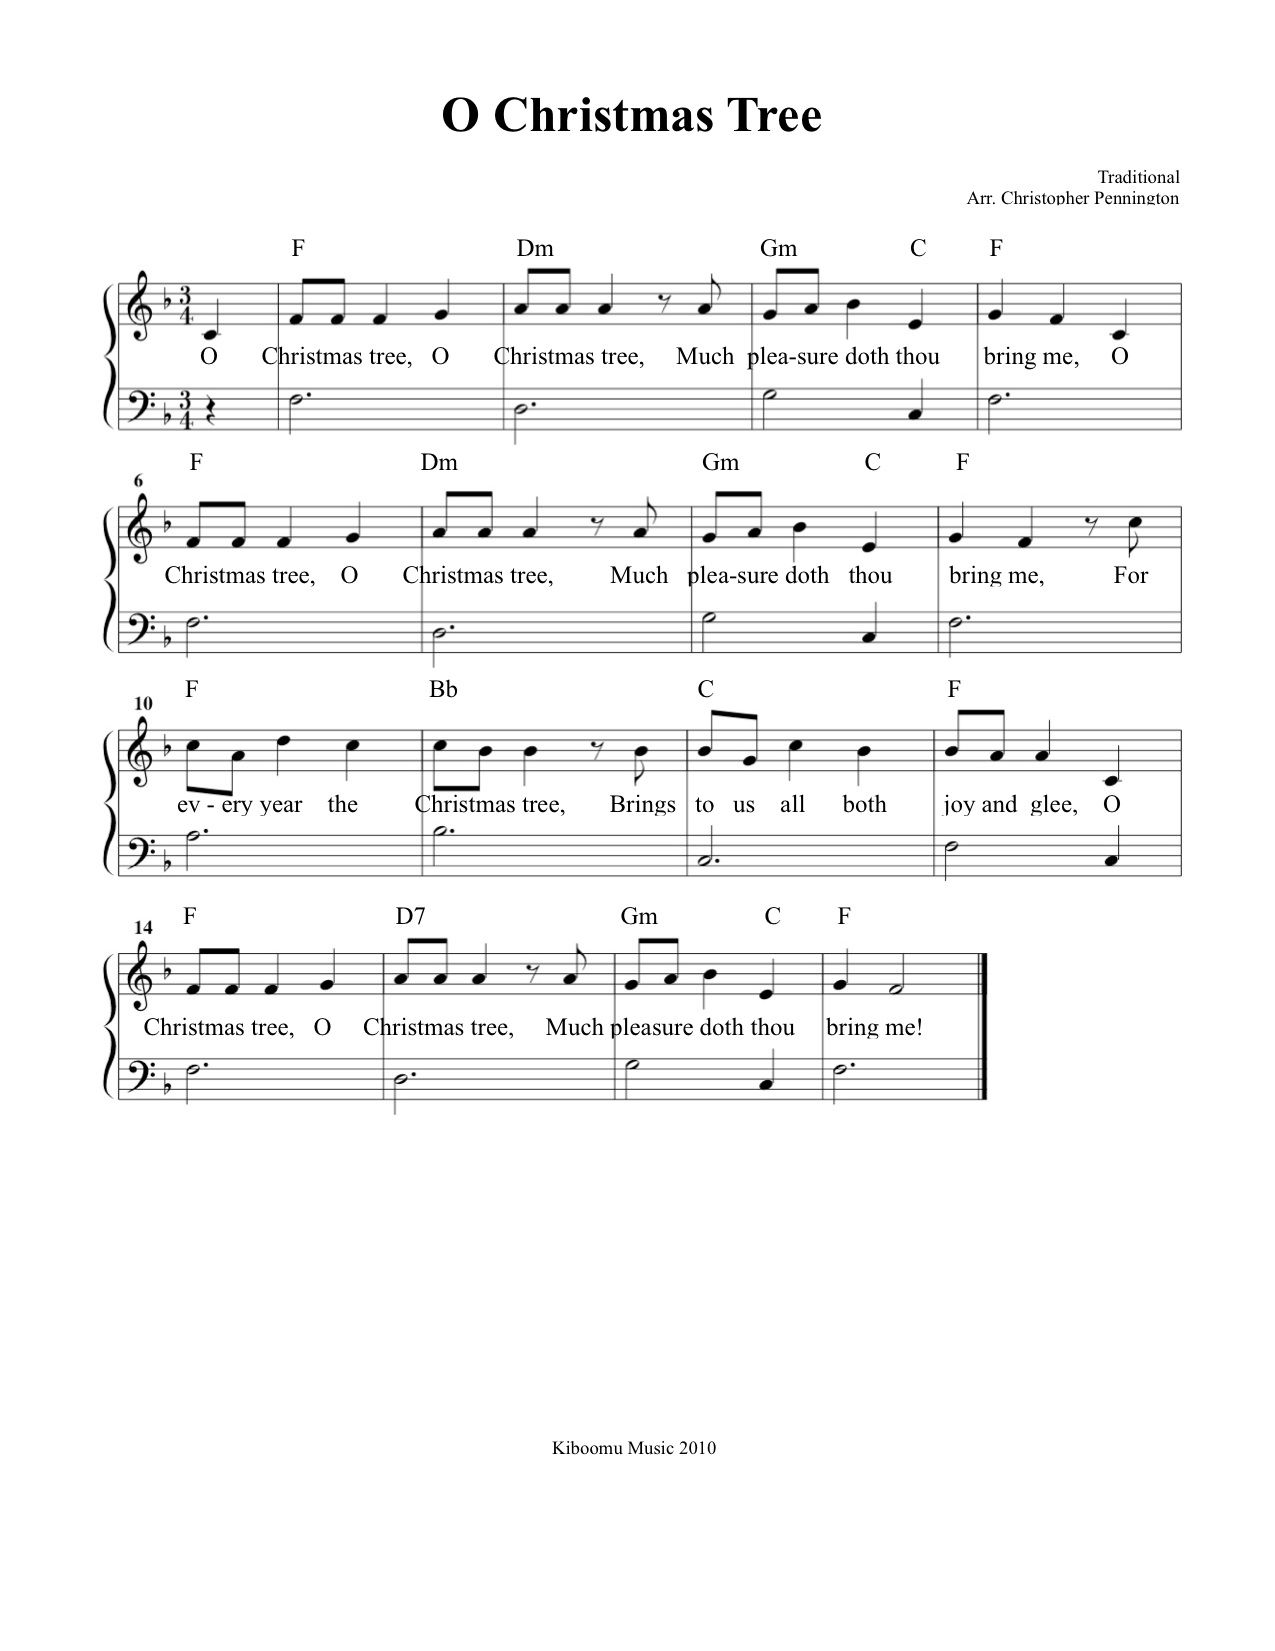 OChristmasTreeSheetMusic.jpg (1275×1651) (With images